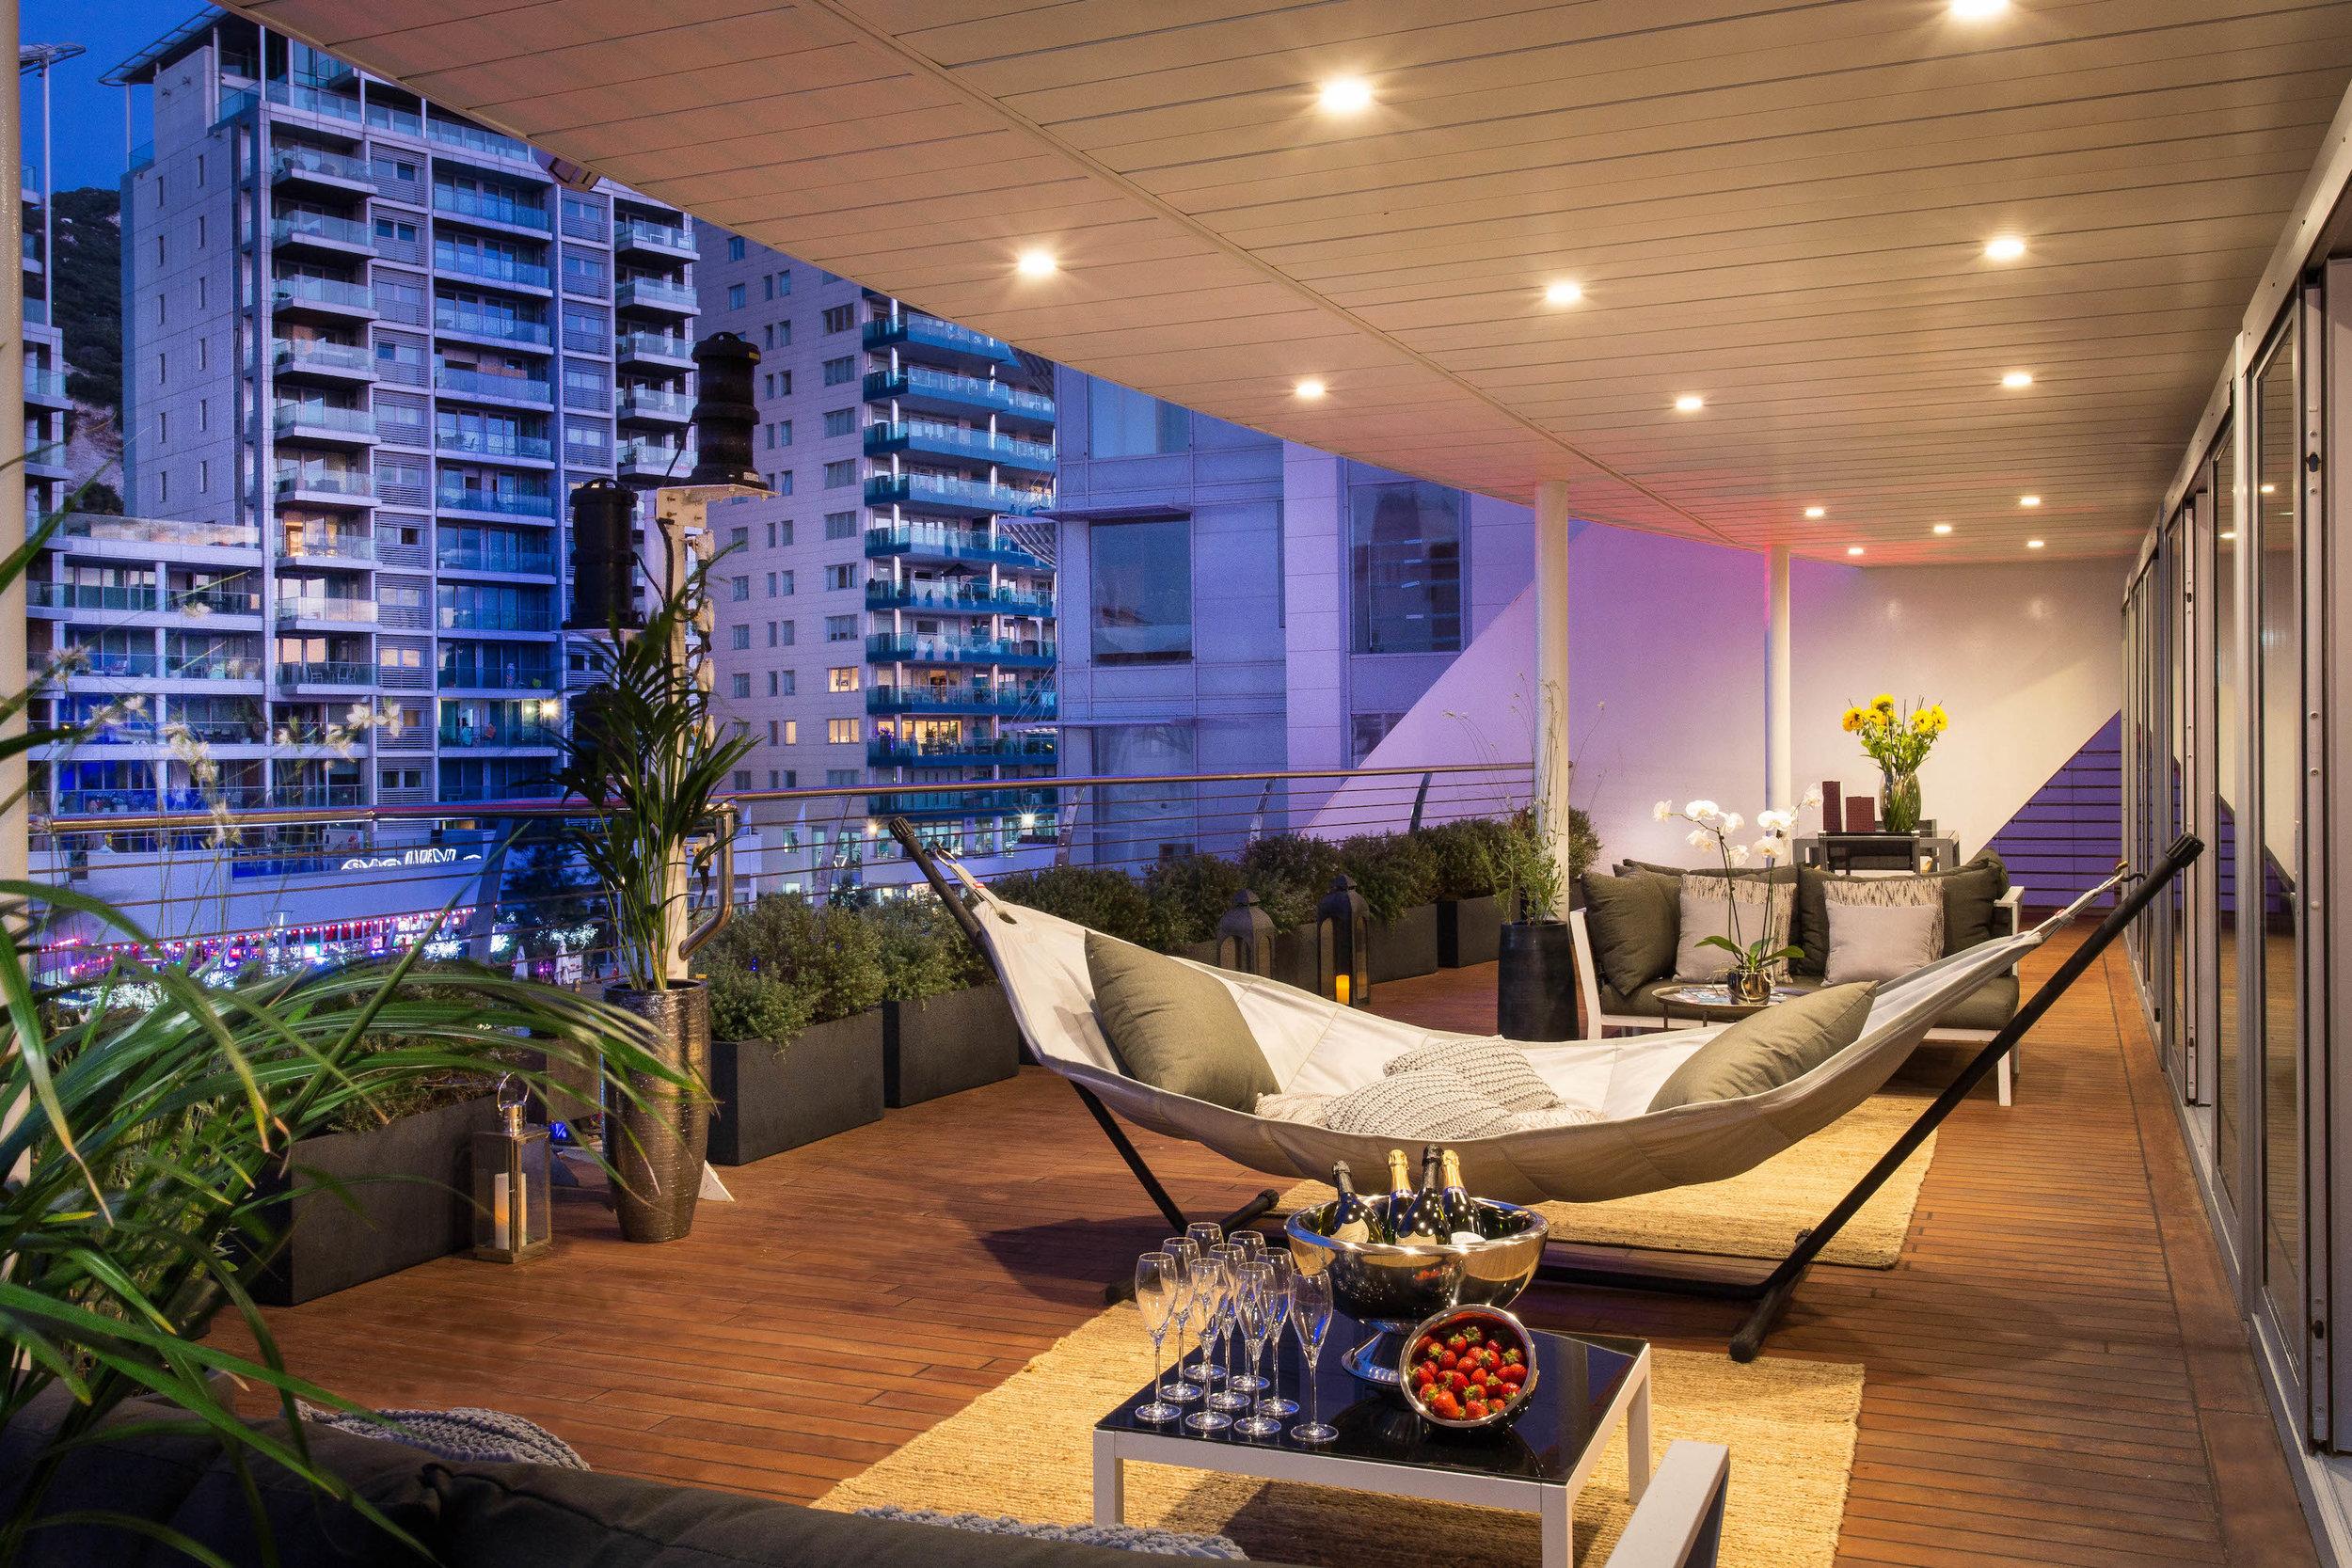 penthouse-perks.jpg